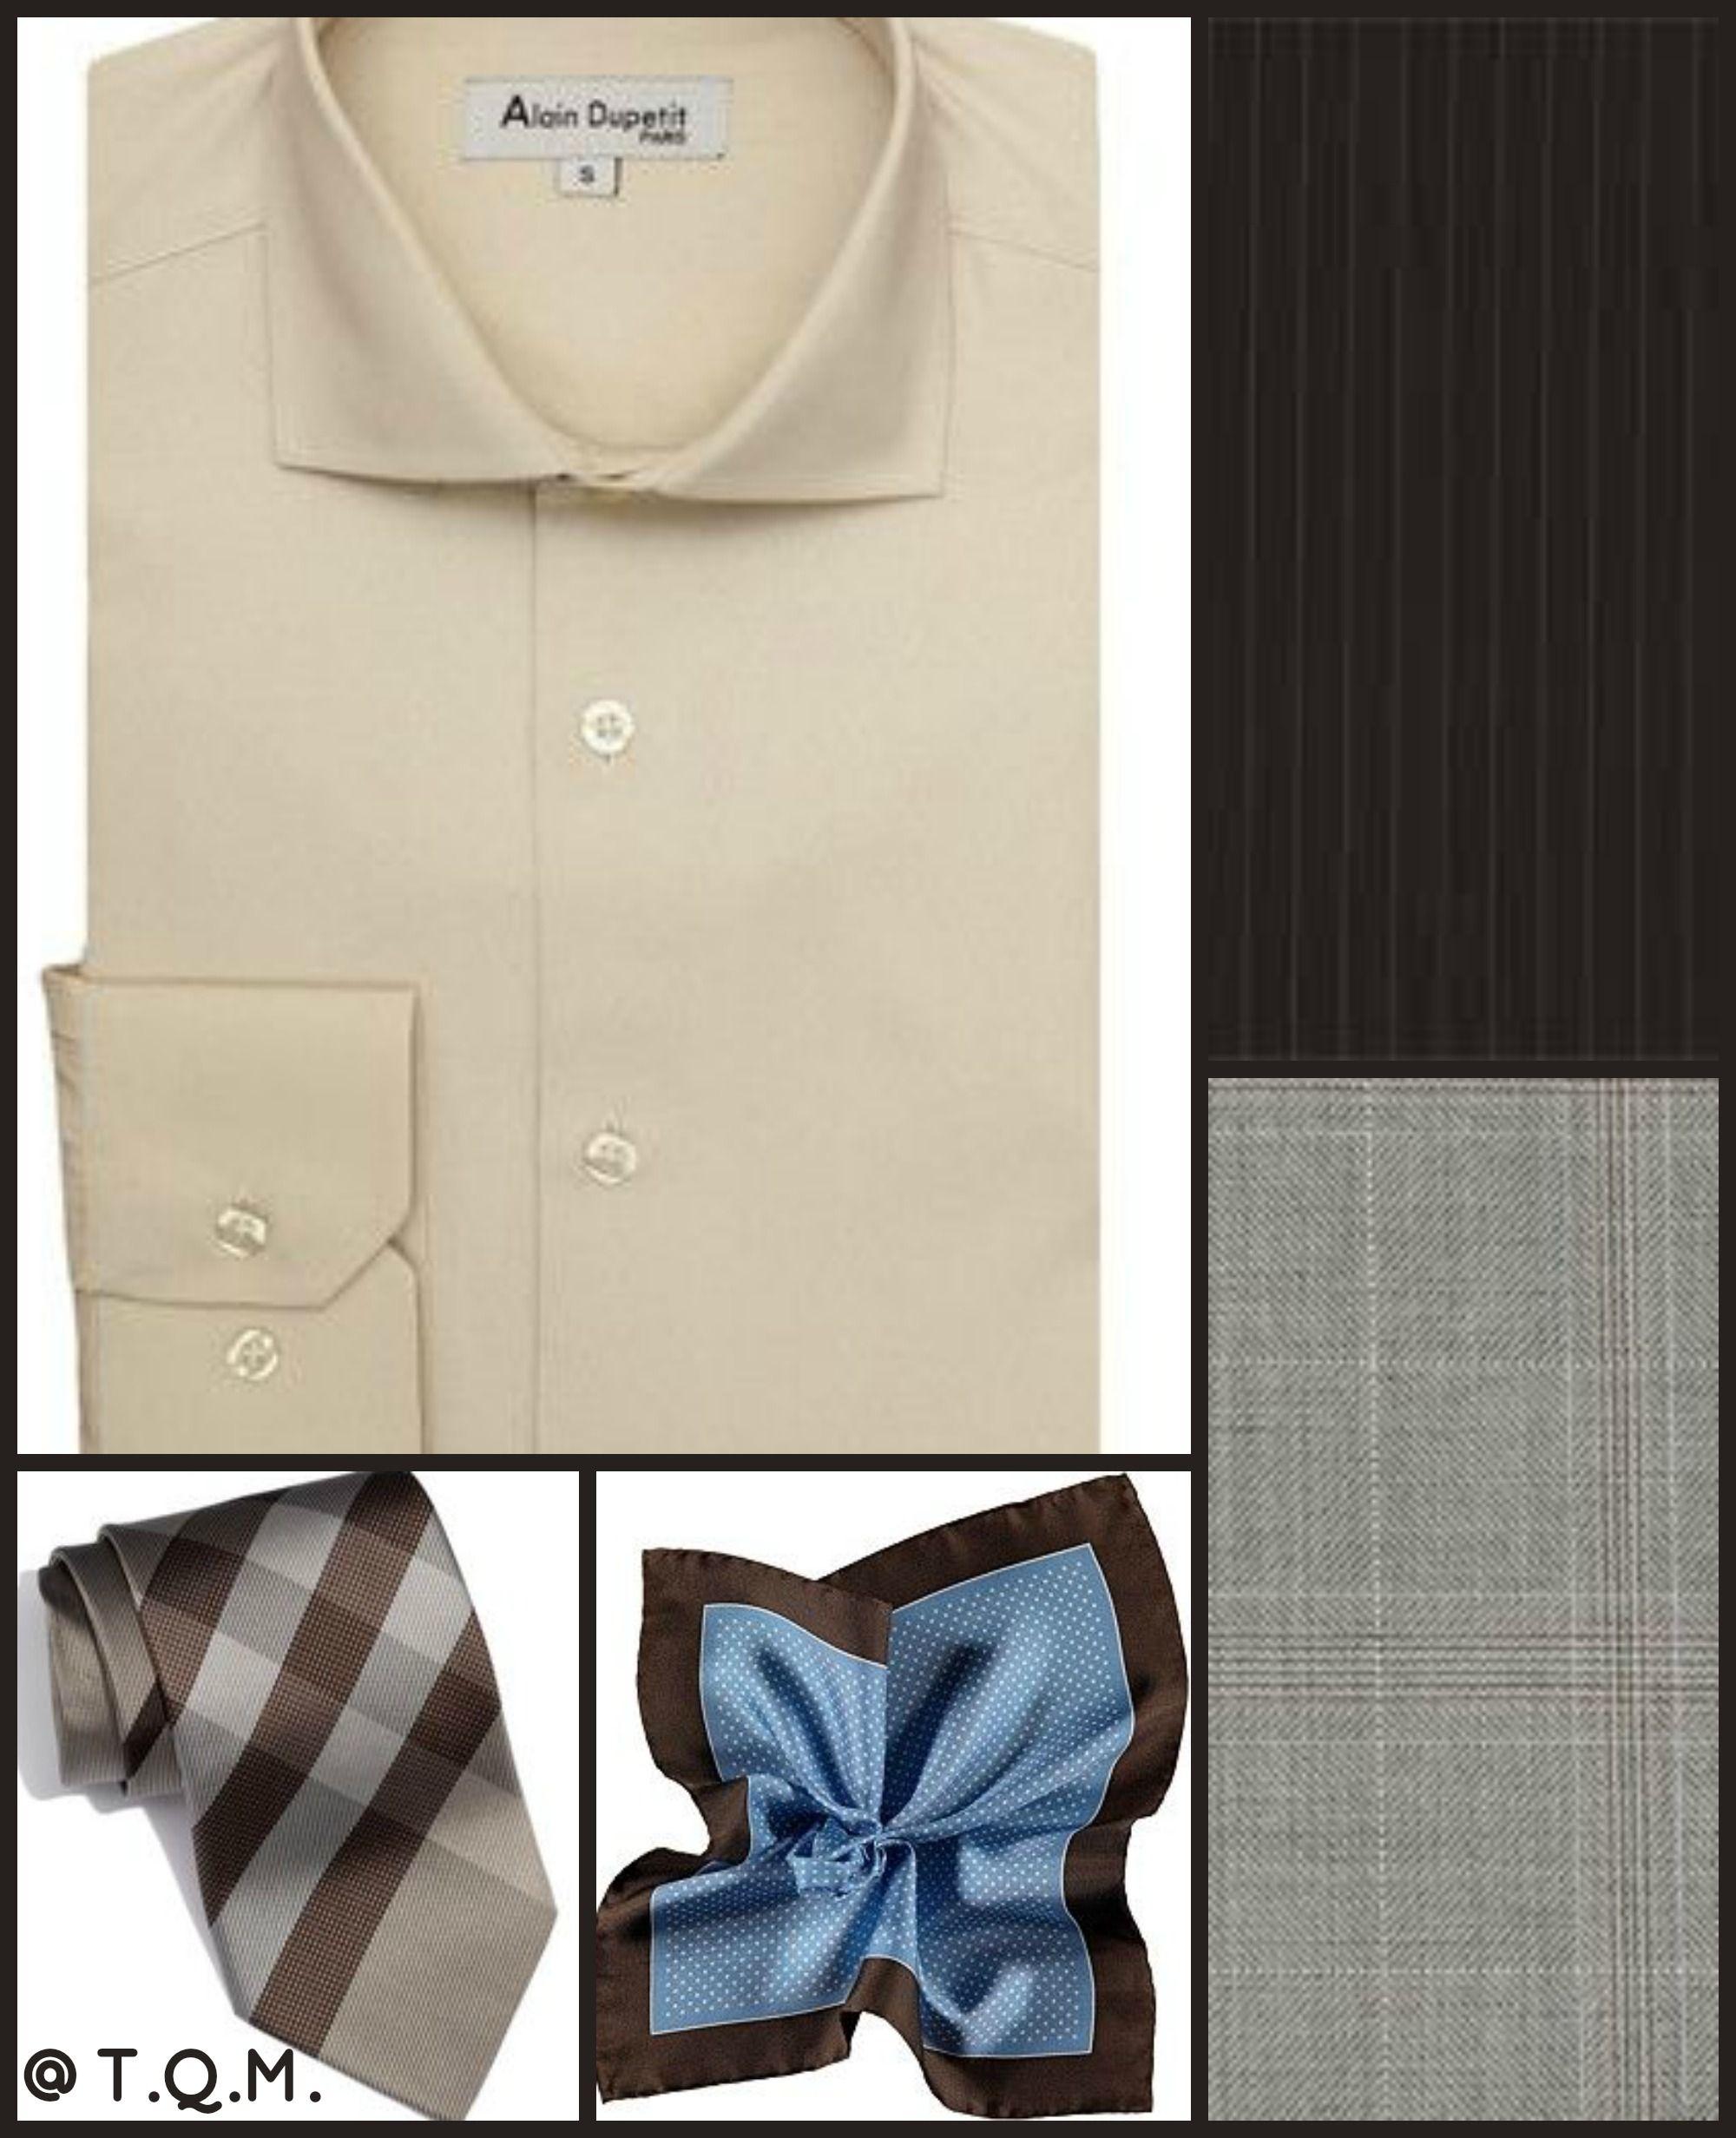 Shirttie Combo Alain Dupetitshirt Burberrytie Suit Supply